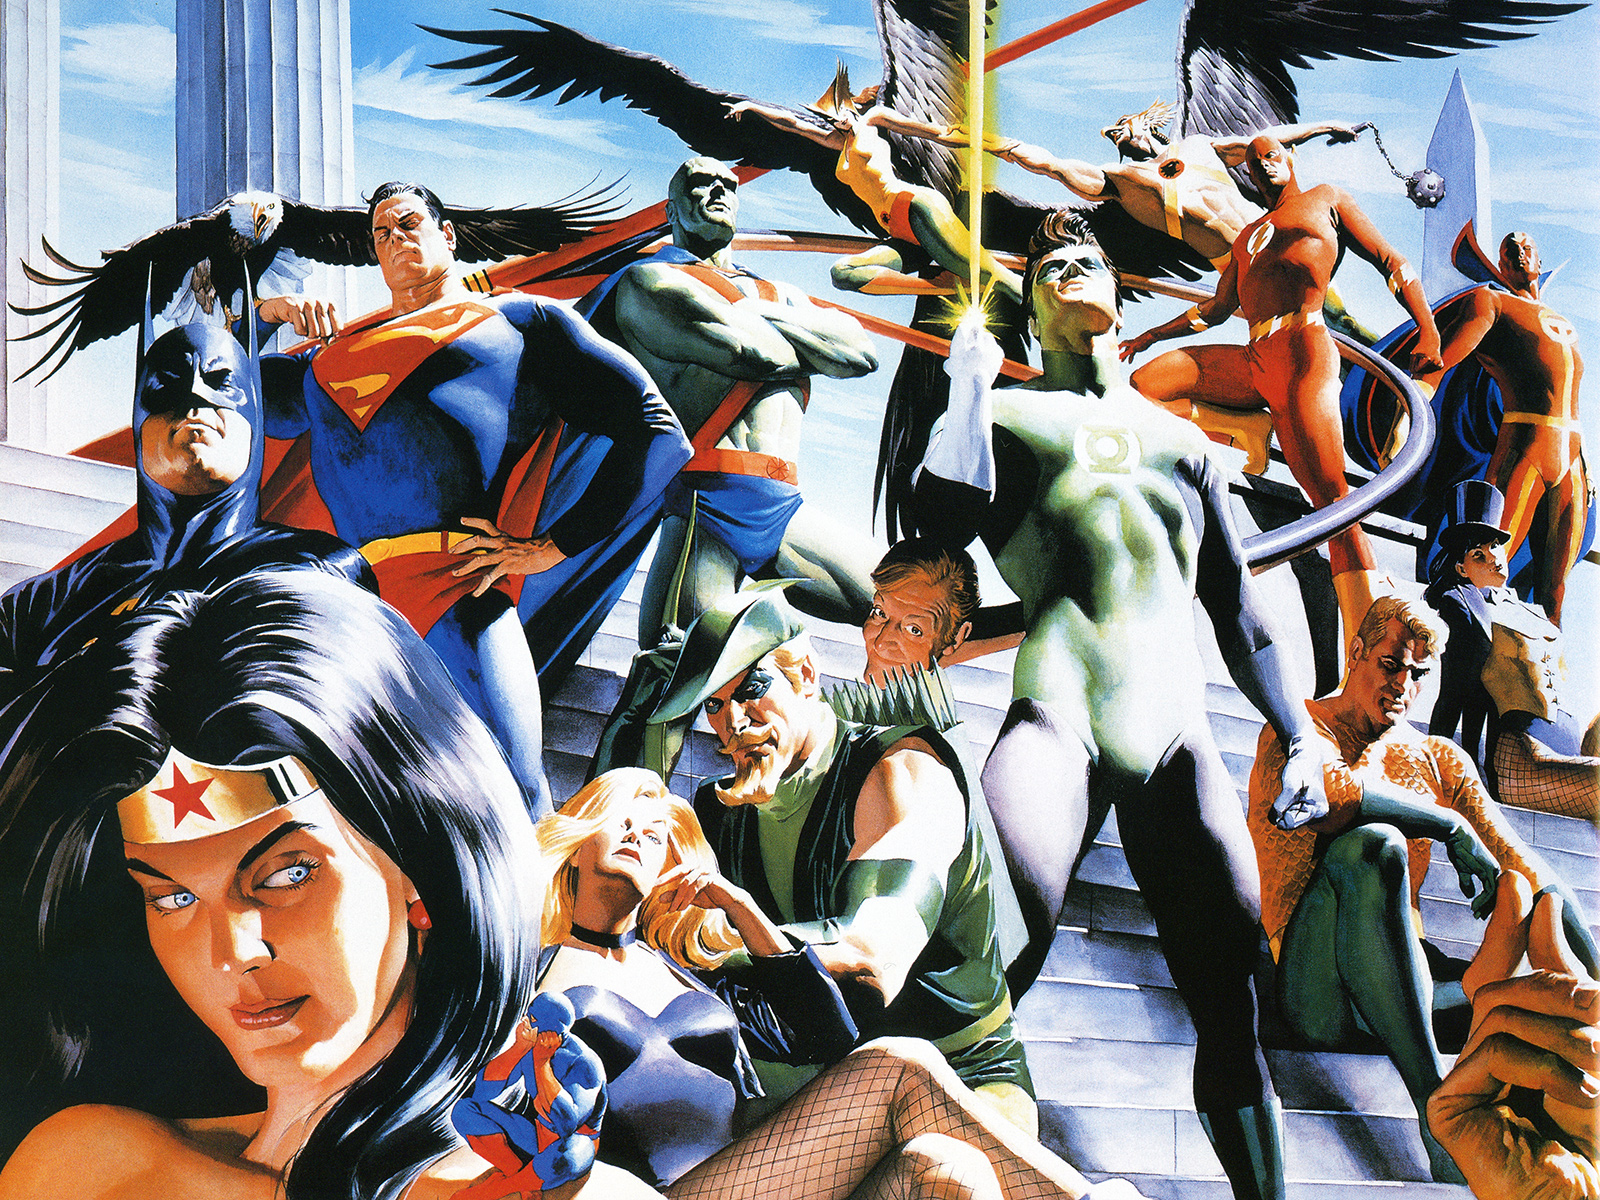 inside-details-on-how-warner-bros-is-handling-the-dc-comics-universe